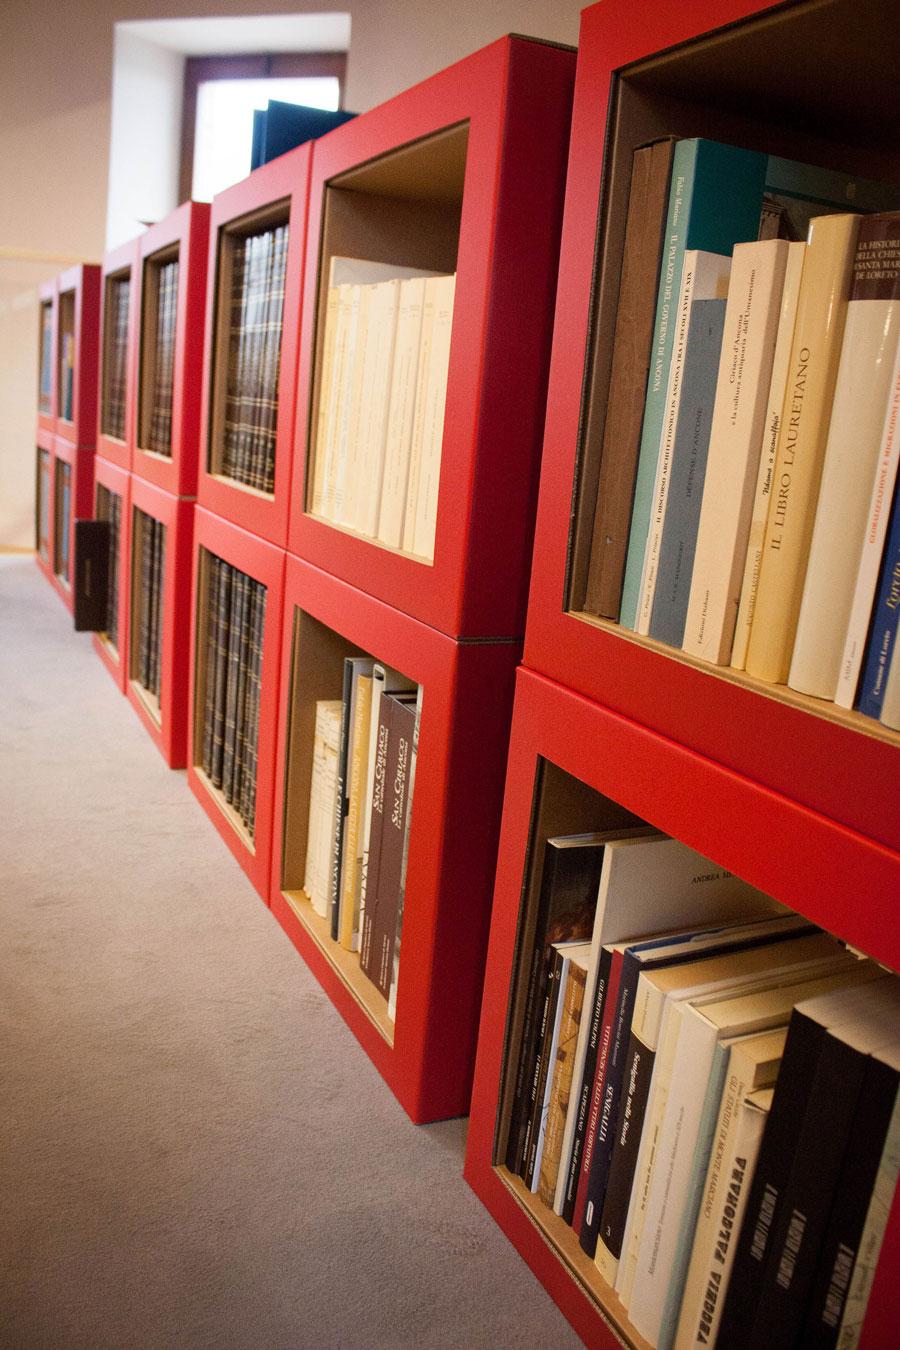 am nagement biblioth que santa maria nuova mobilier en carton architexture carton. Black Bedroom Furniture Sets. Home Design Ideas